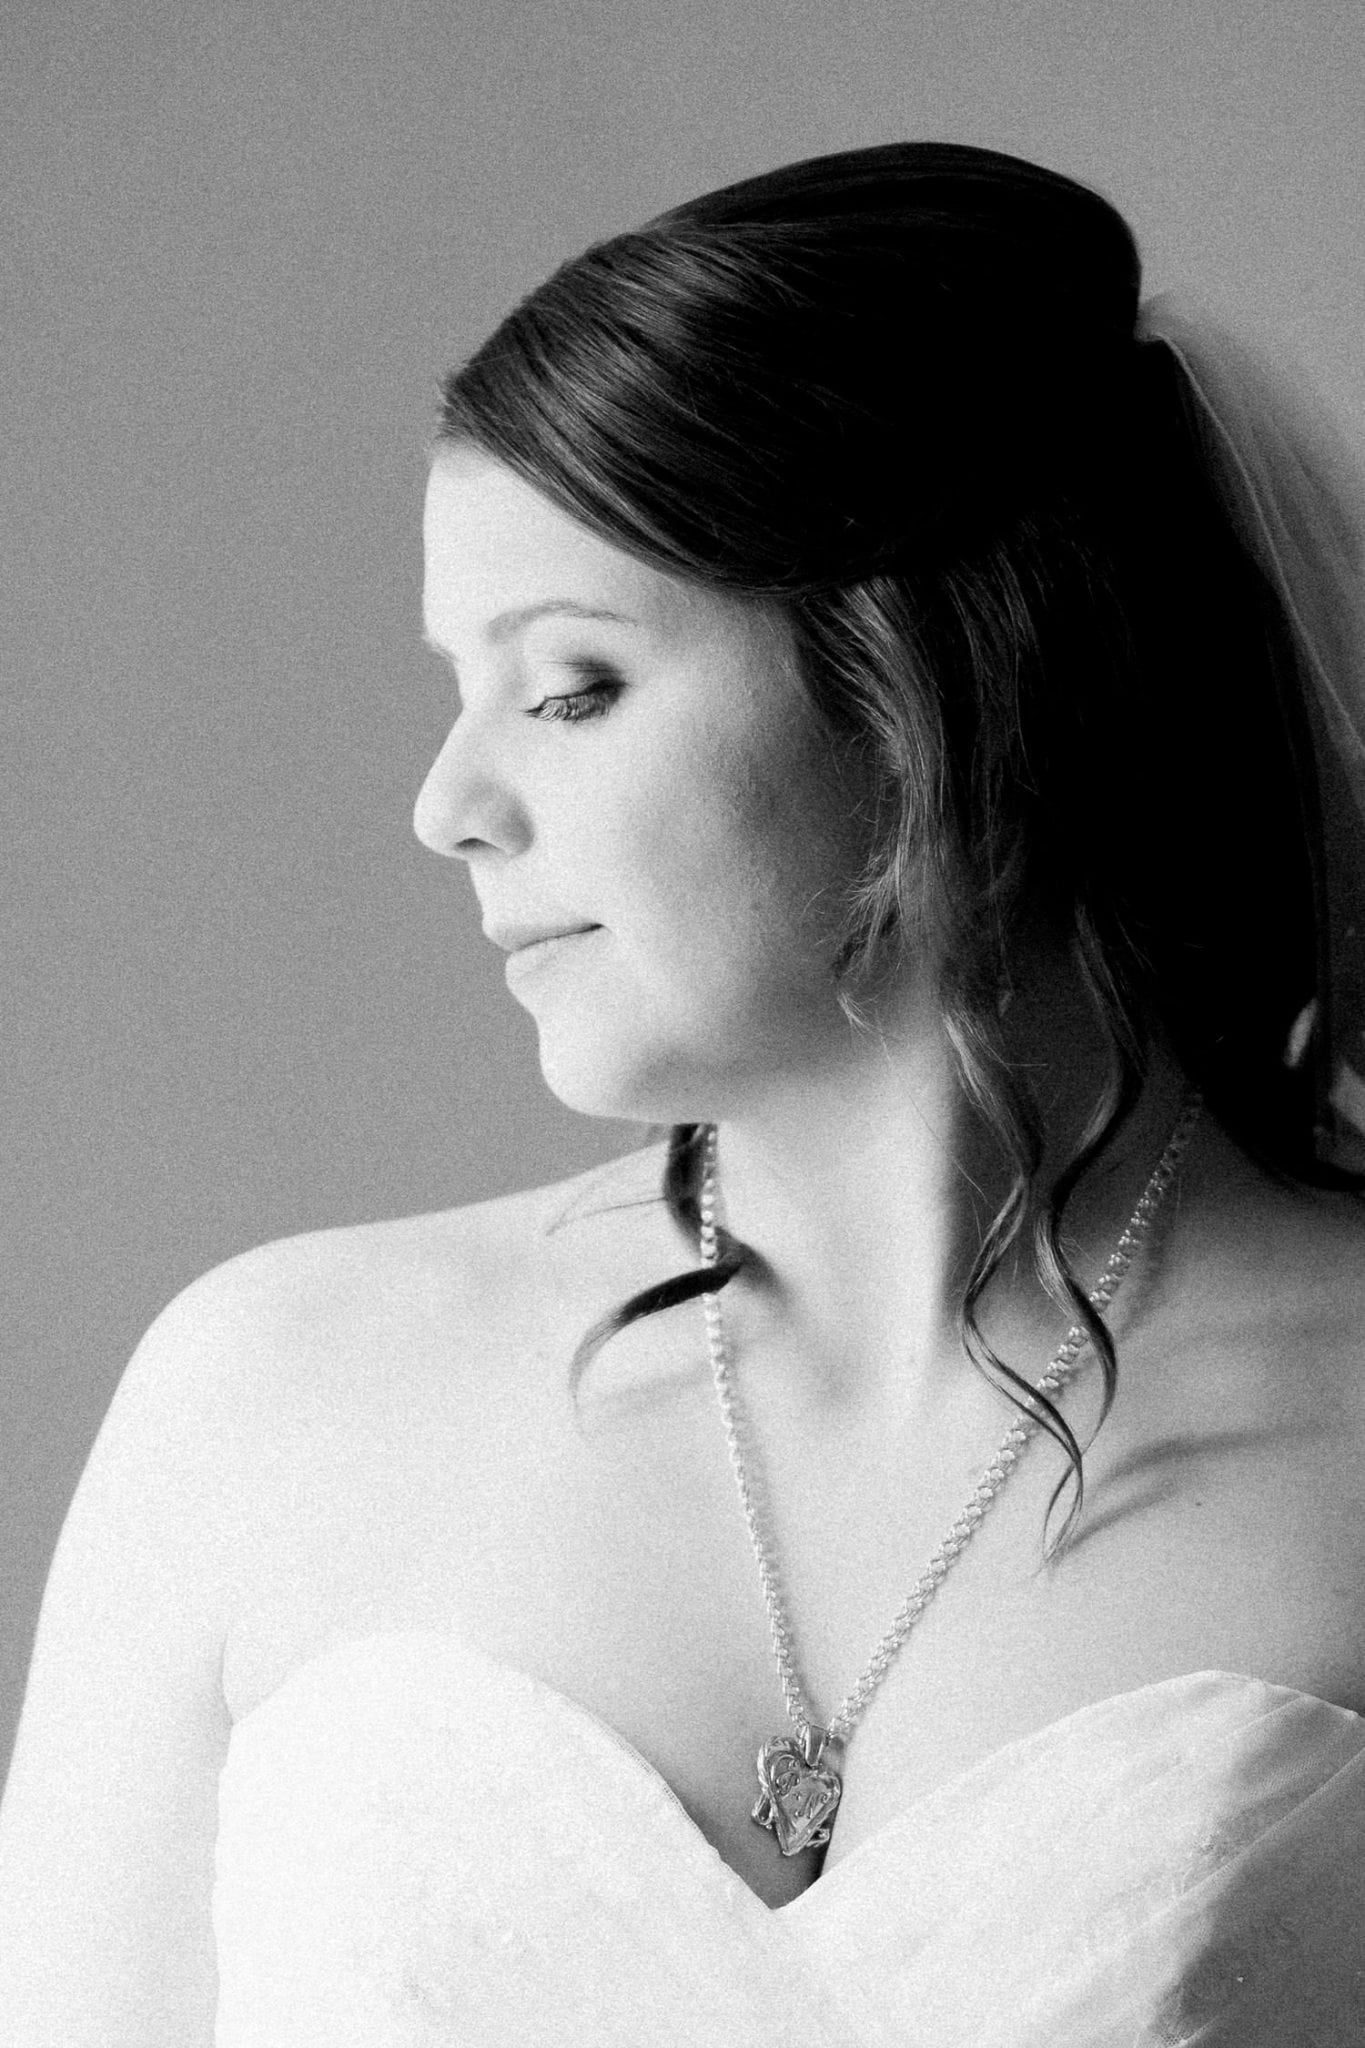 Bride portrait in b/w | Vancouver wedding photographer